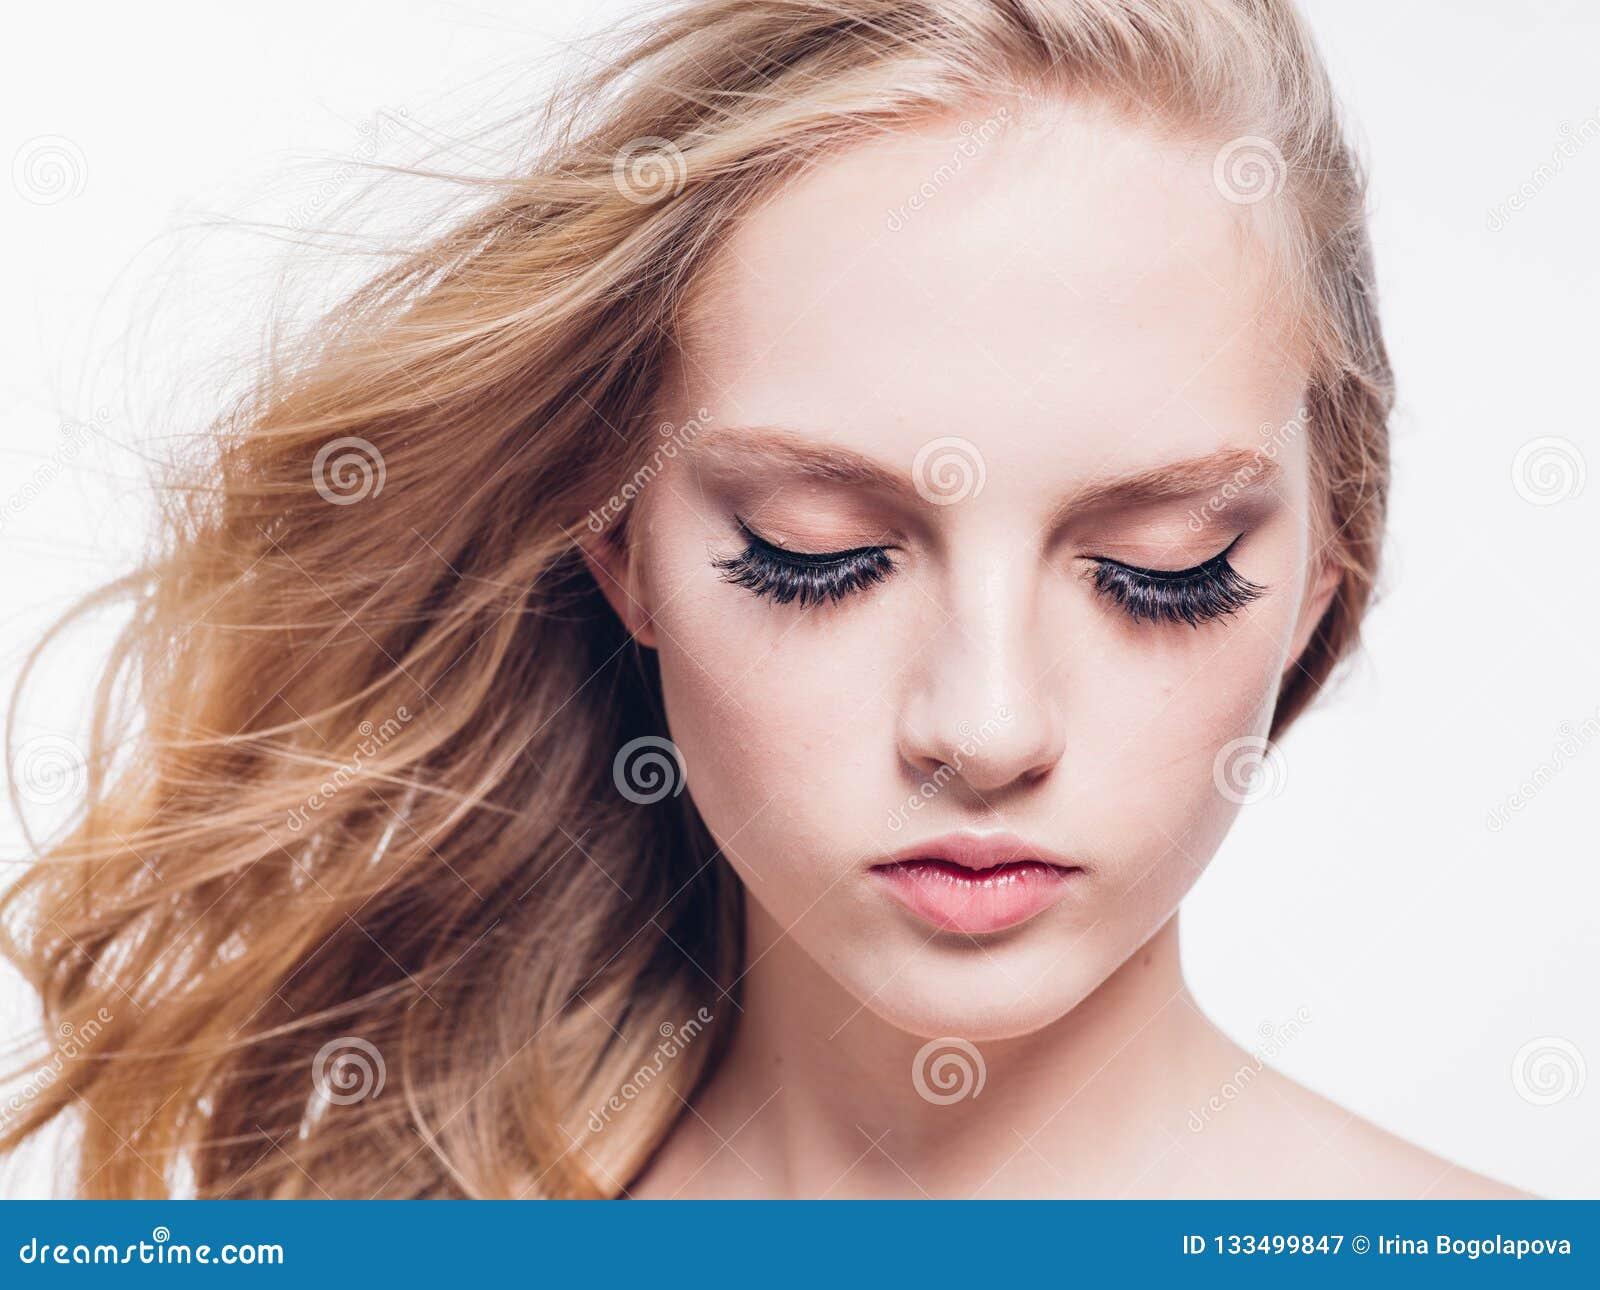 Eyelashes woman eyes face close up with beautiful long lashes is